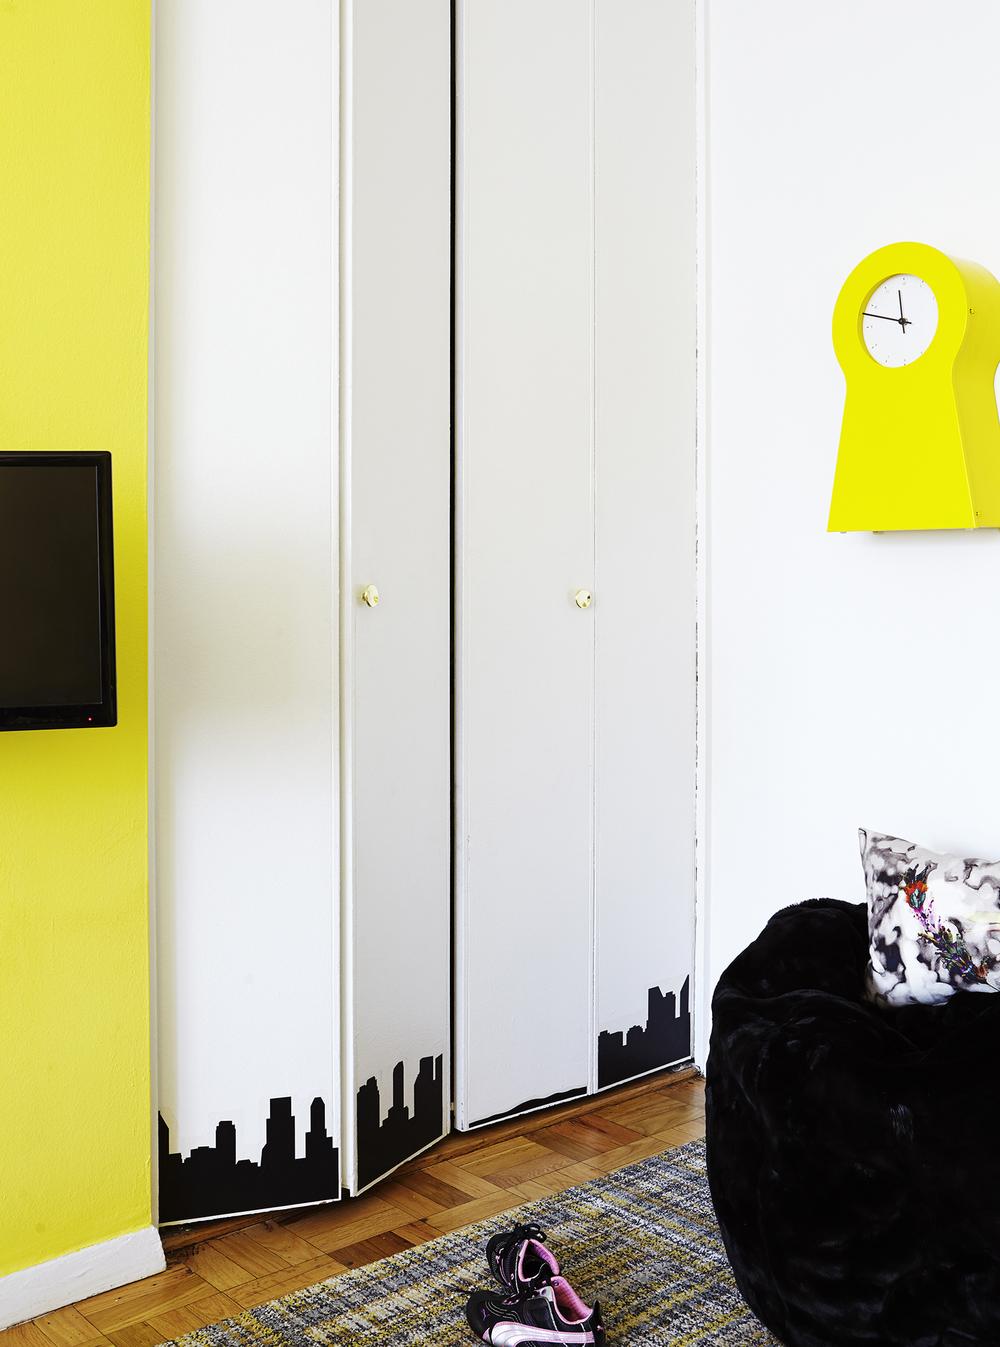 PJ_Interiors_086.jpg